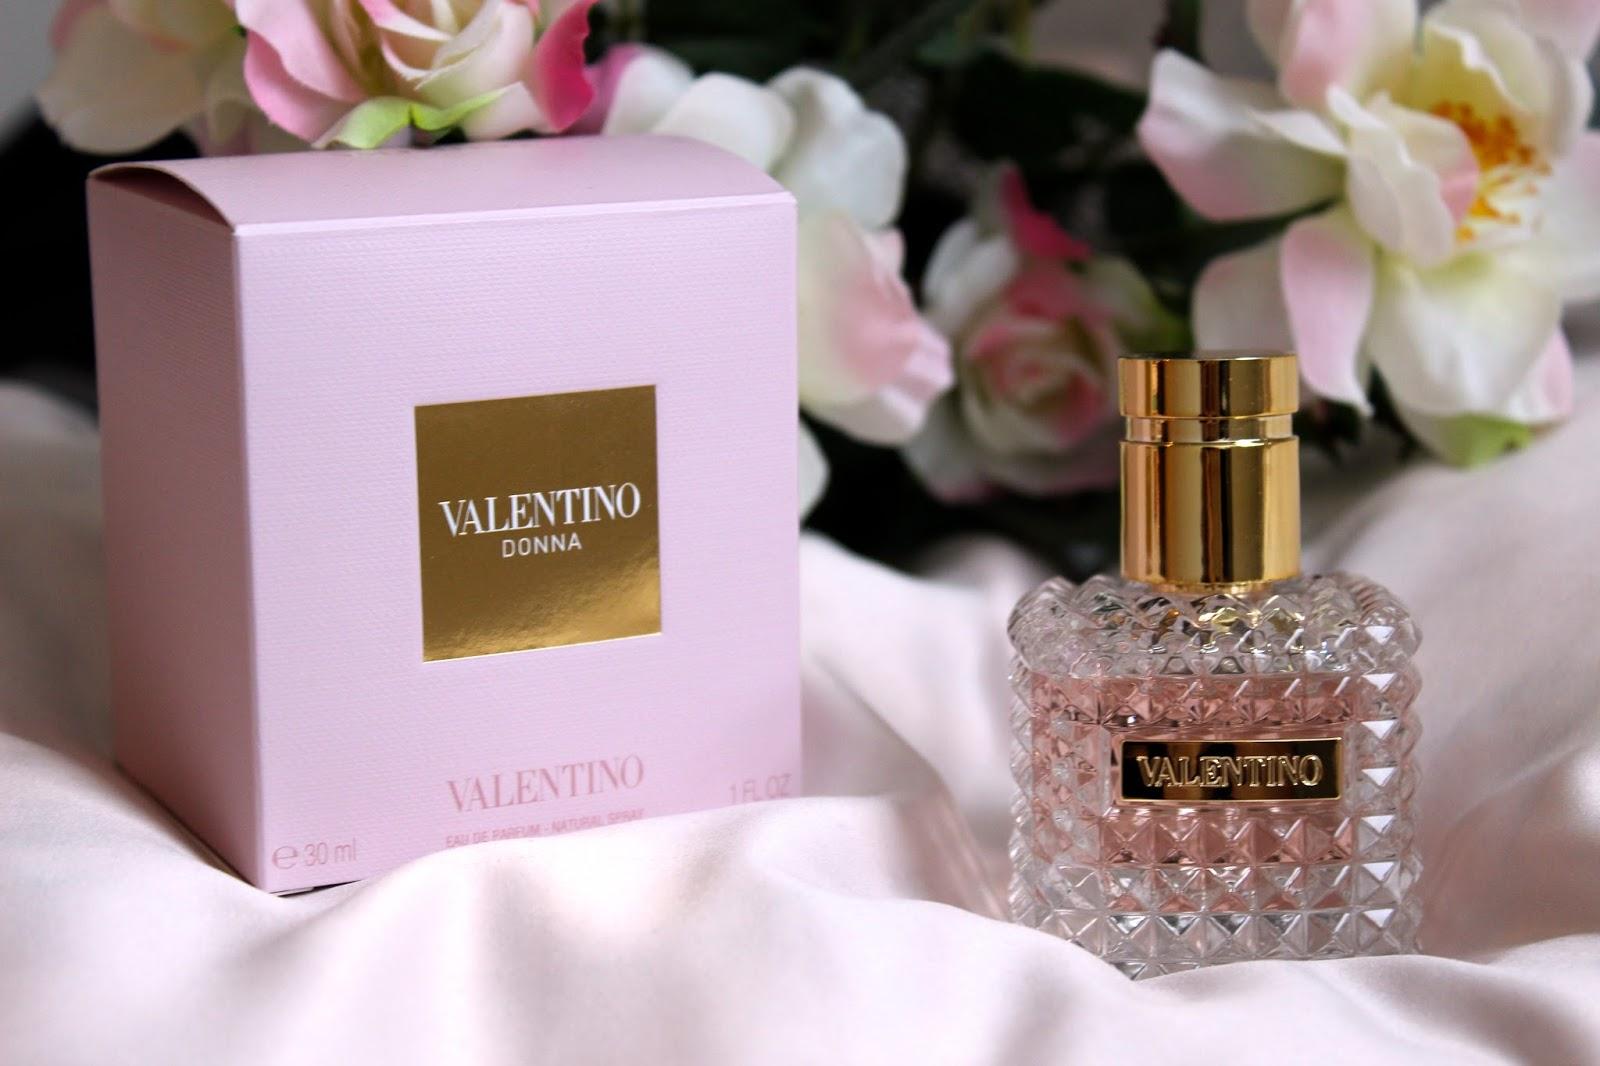 Valentino_Donna_Perfume.JPG